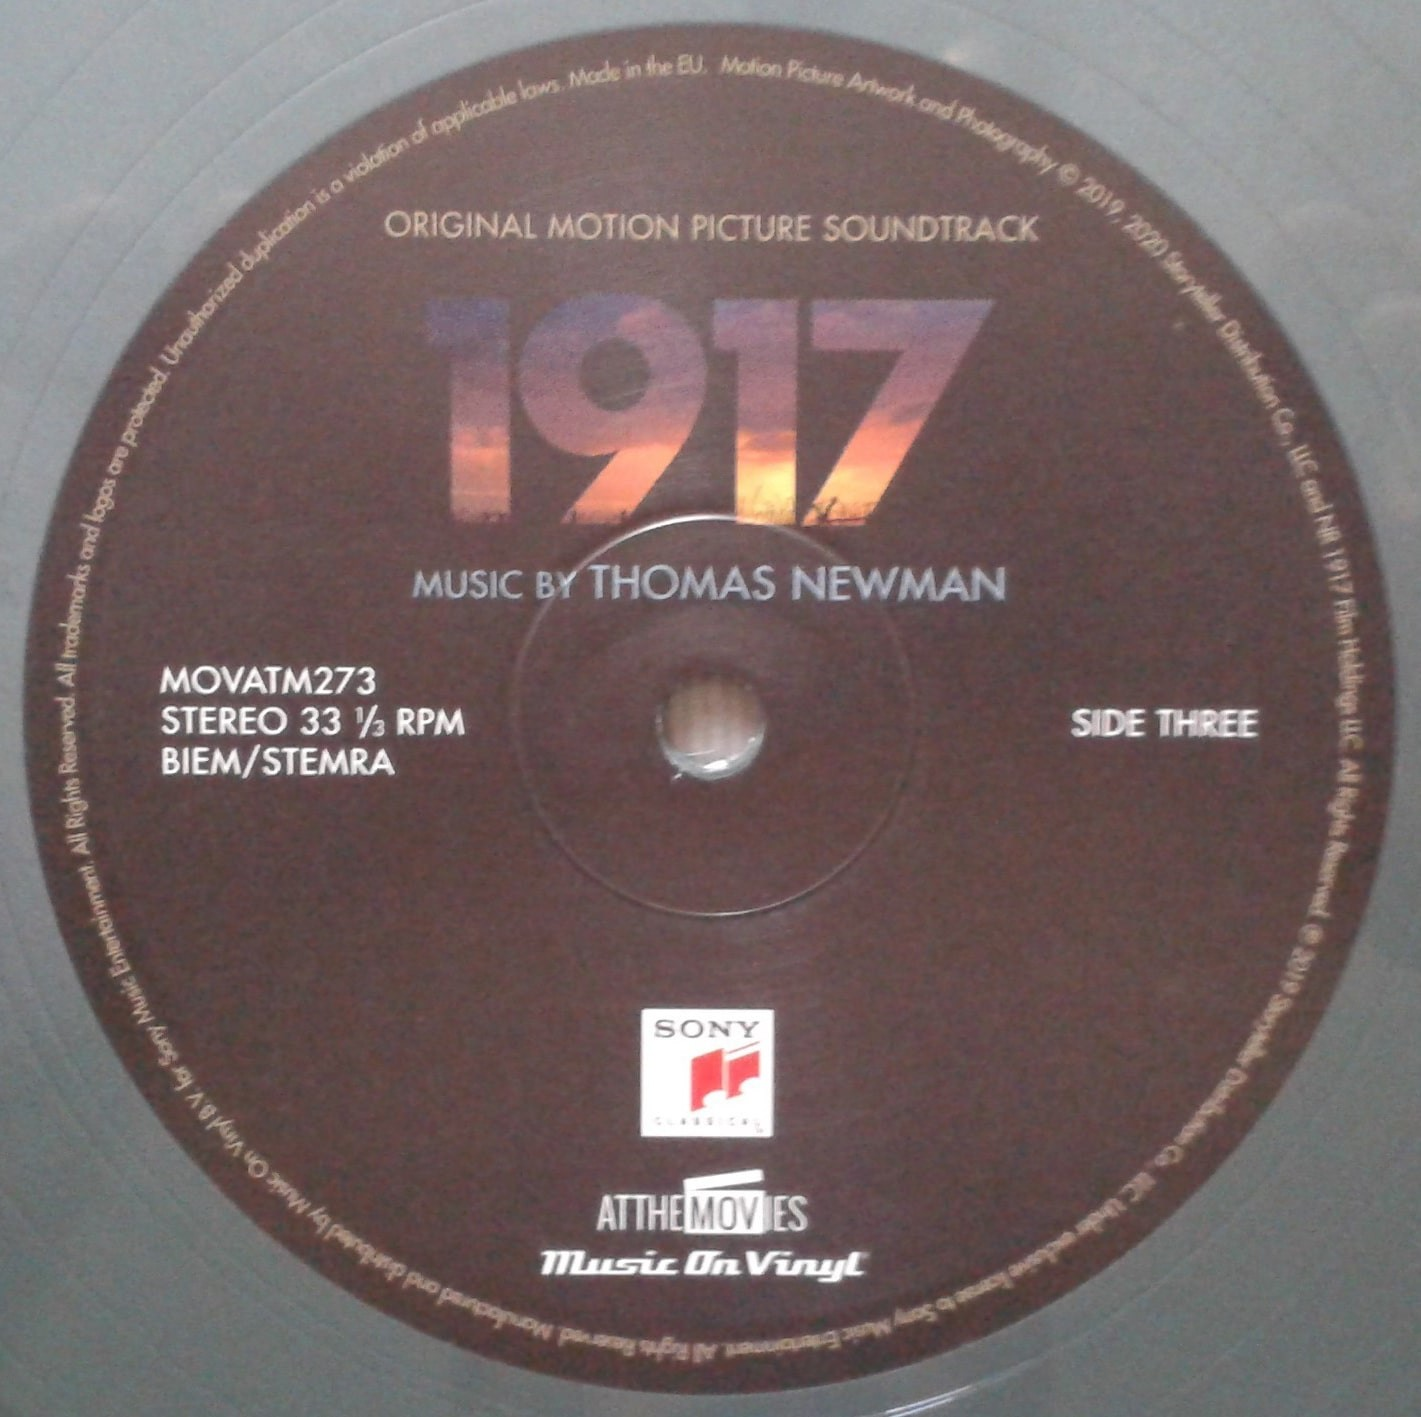 9-1917-nalepka-na-lp2-min.jpg